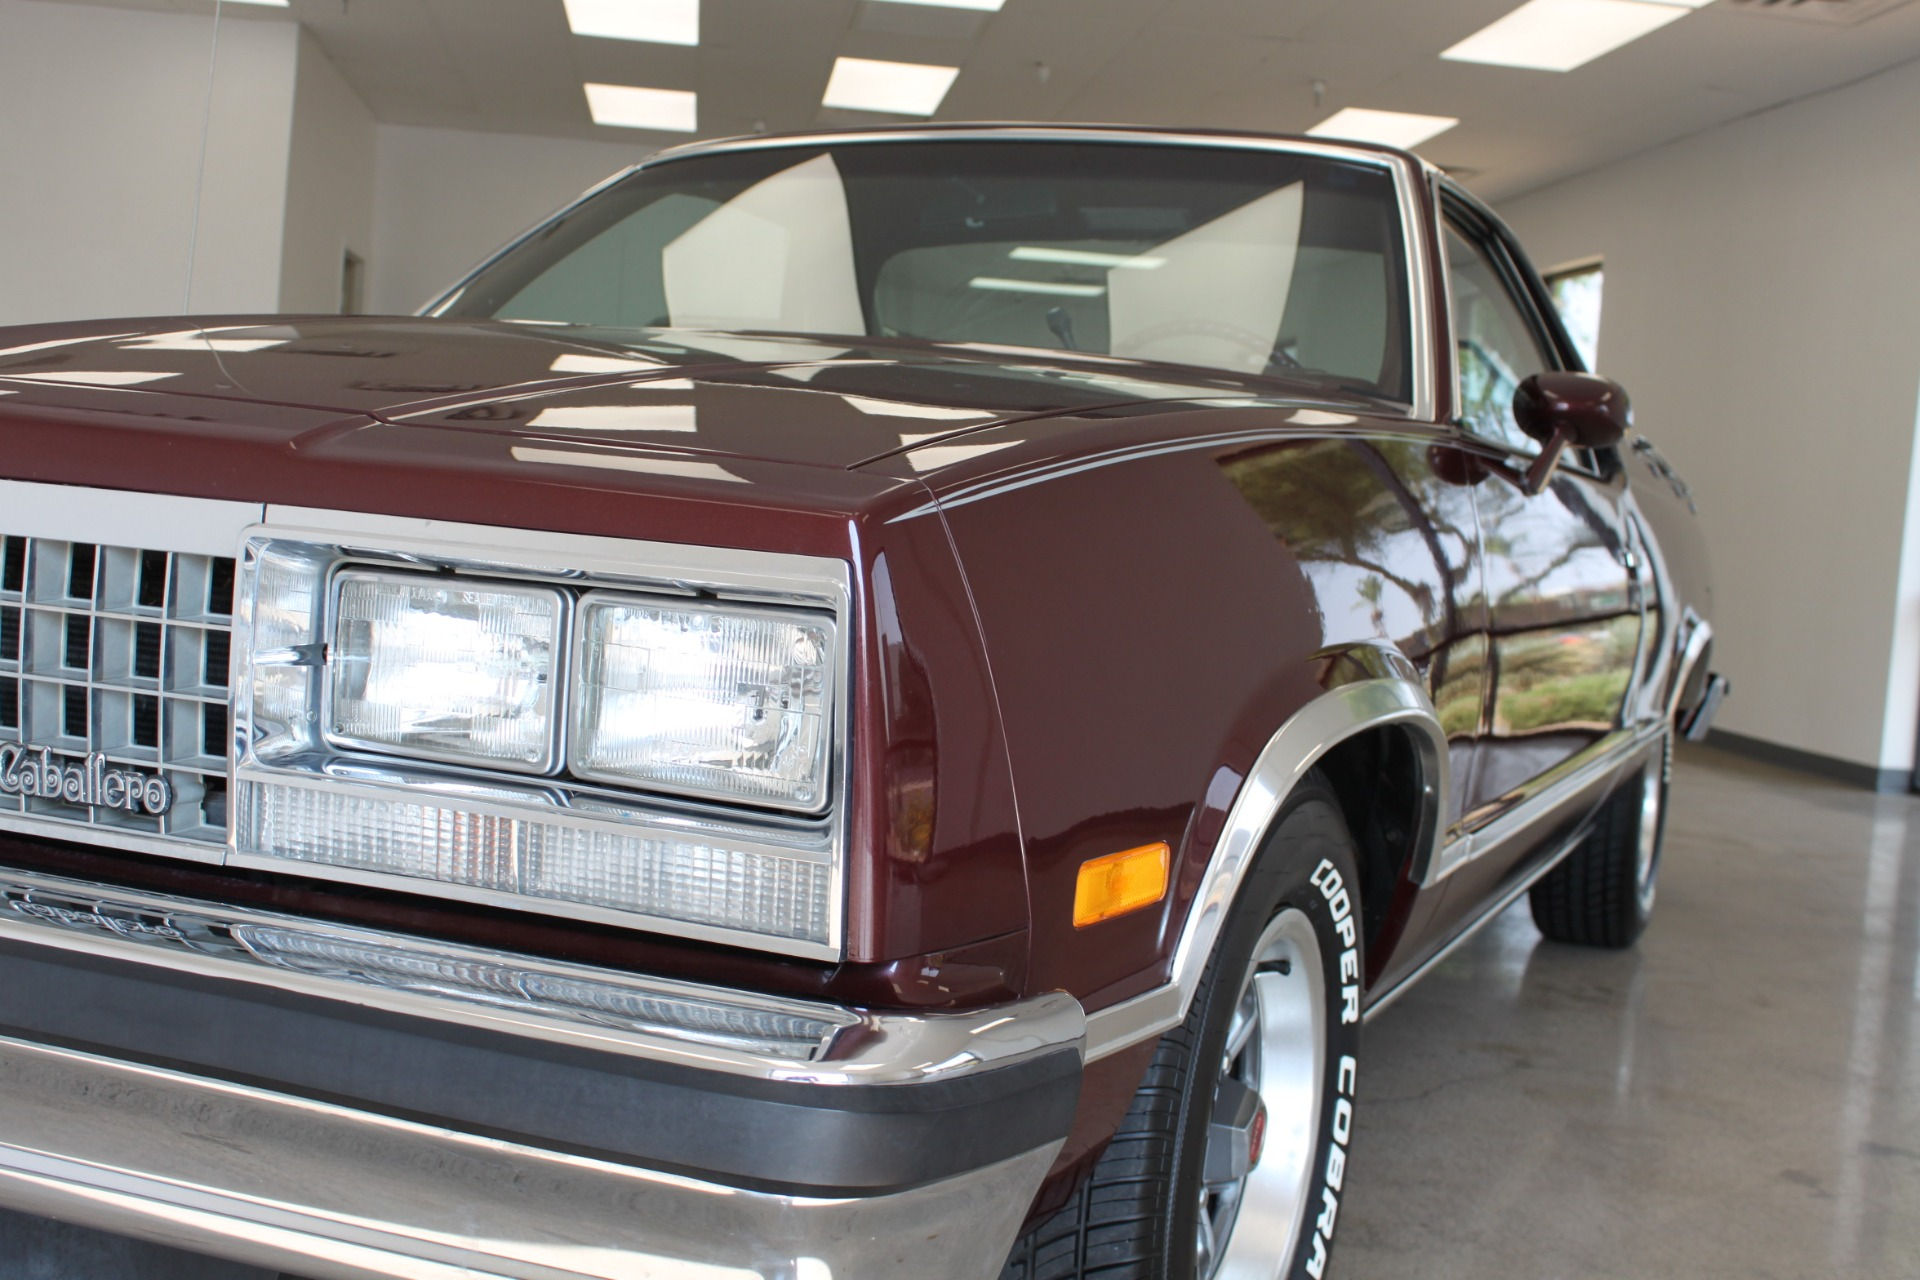 Used-1984-GMC-Caballero-Audi